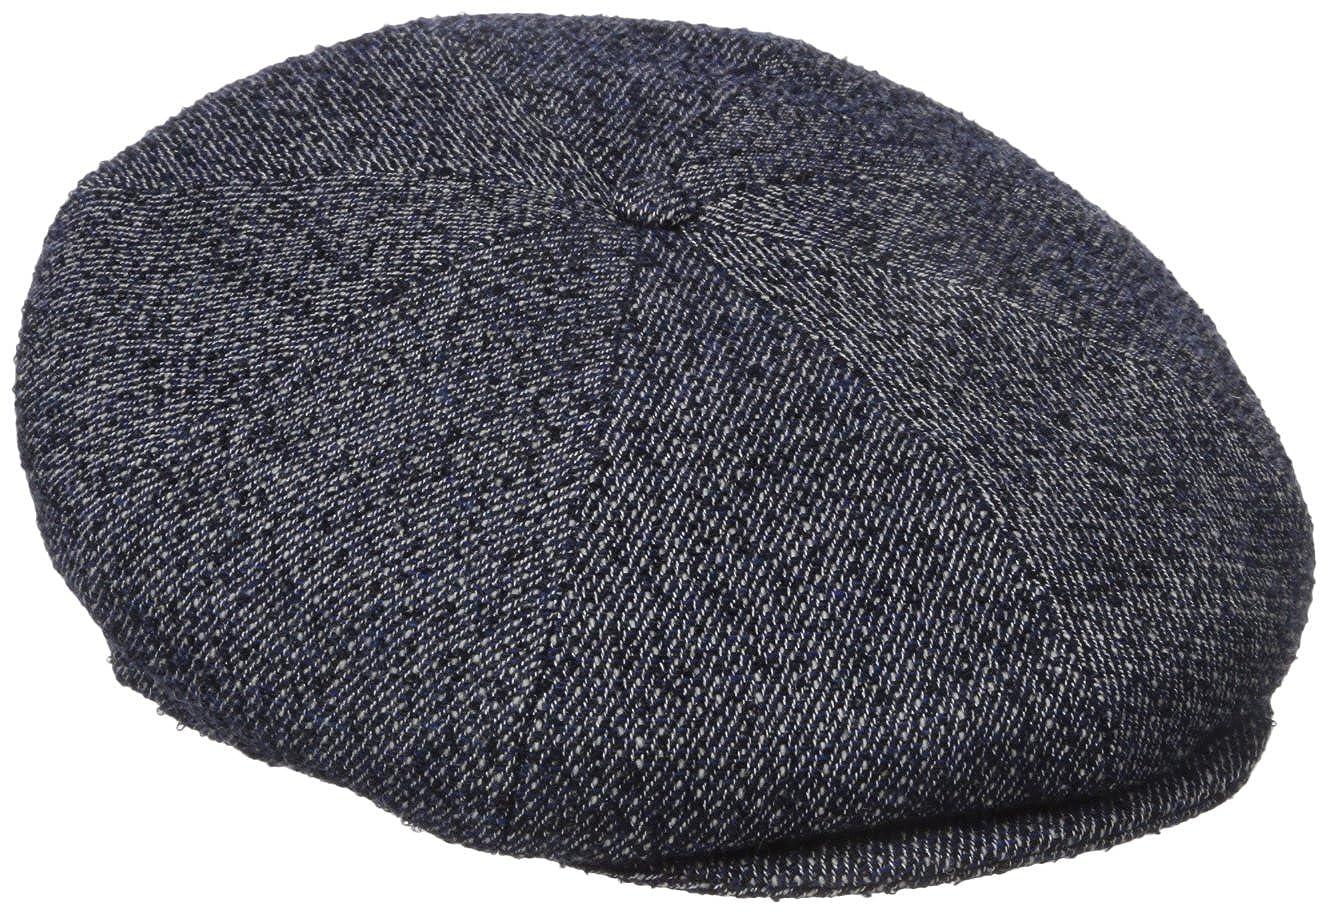 Kangol Men's Tweed Ripley Flat Cap Kangol Headwear K5131HT